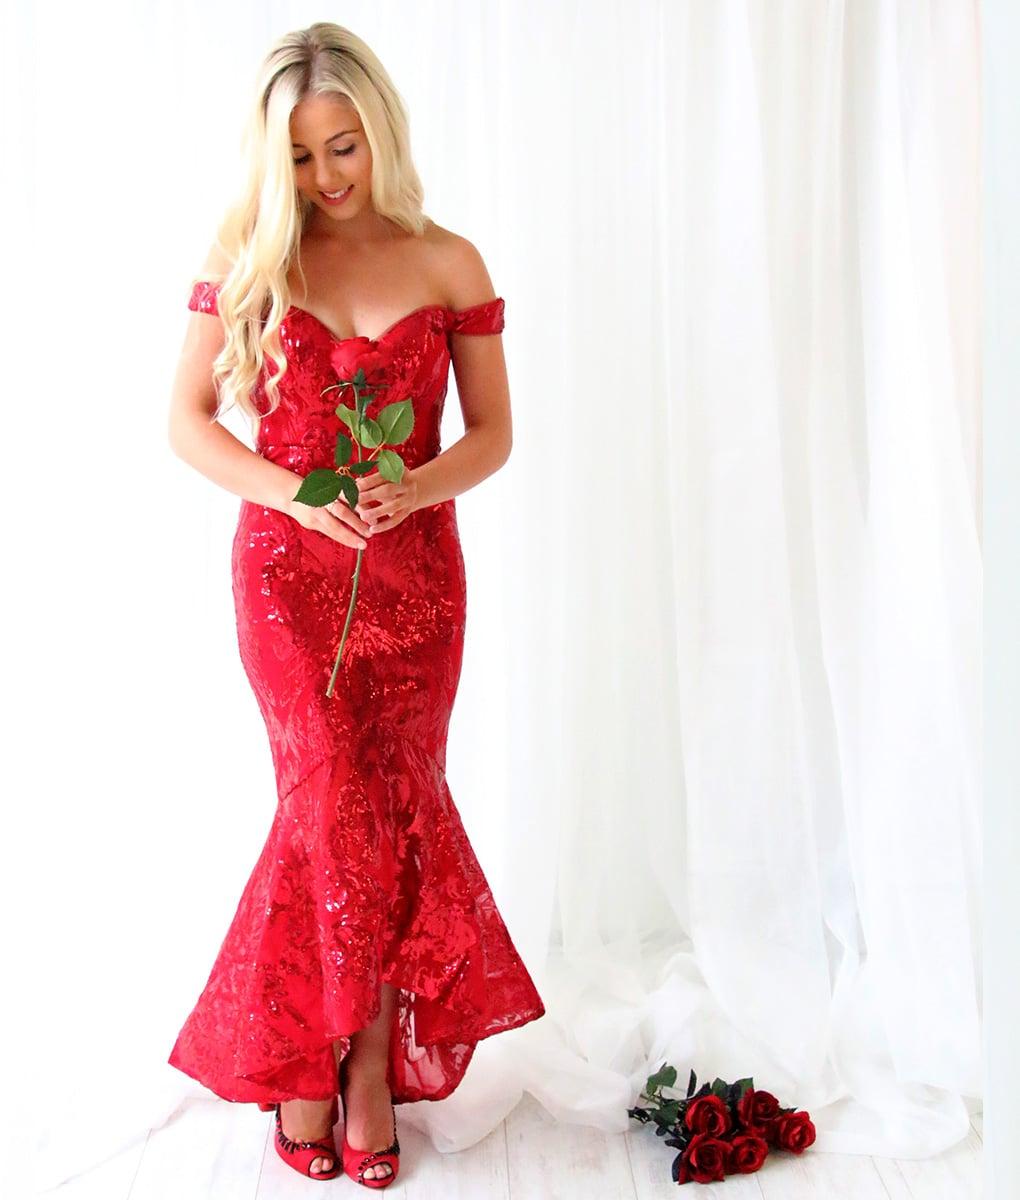 Alila-Burgundy-Sequin-Fishtail-Dress-Bariano-Dress